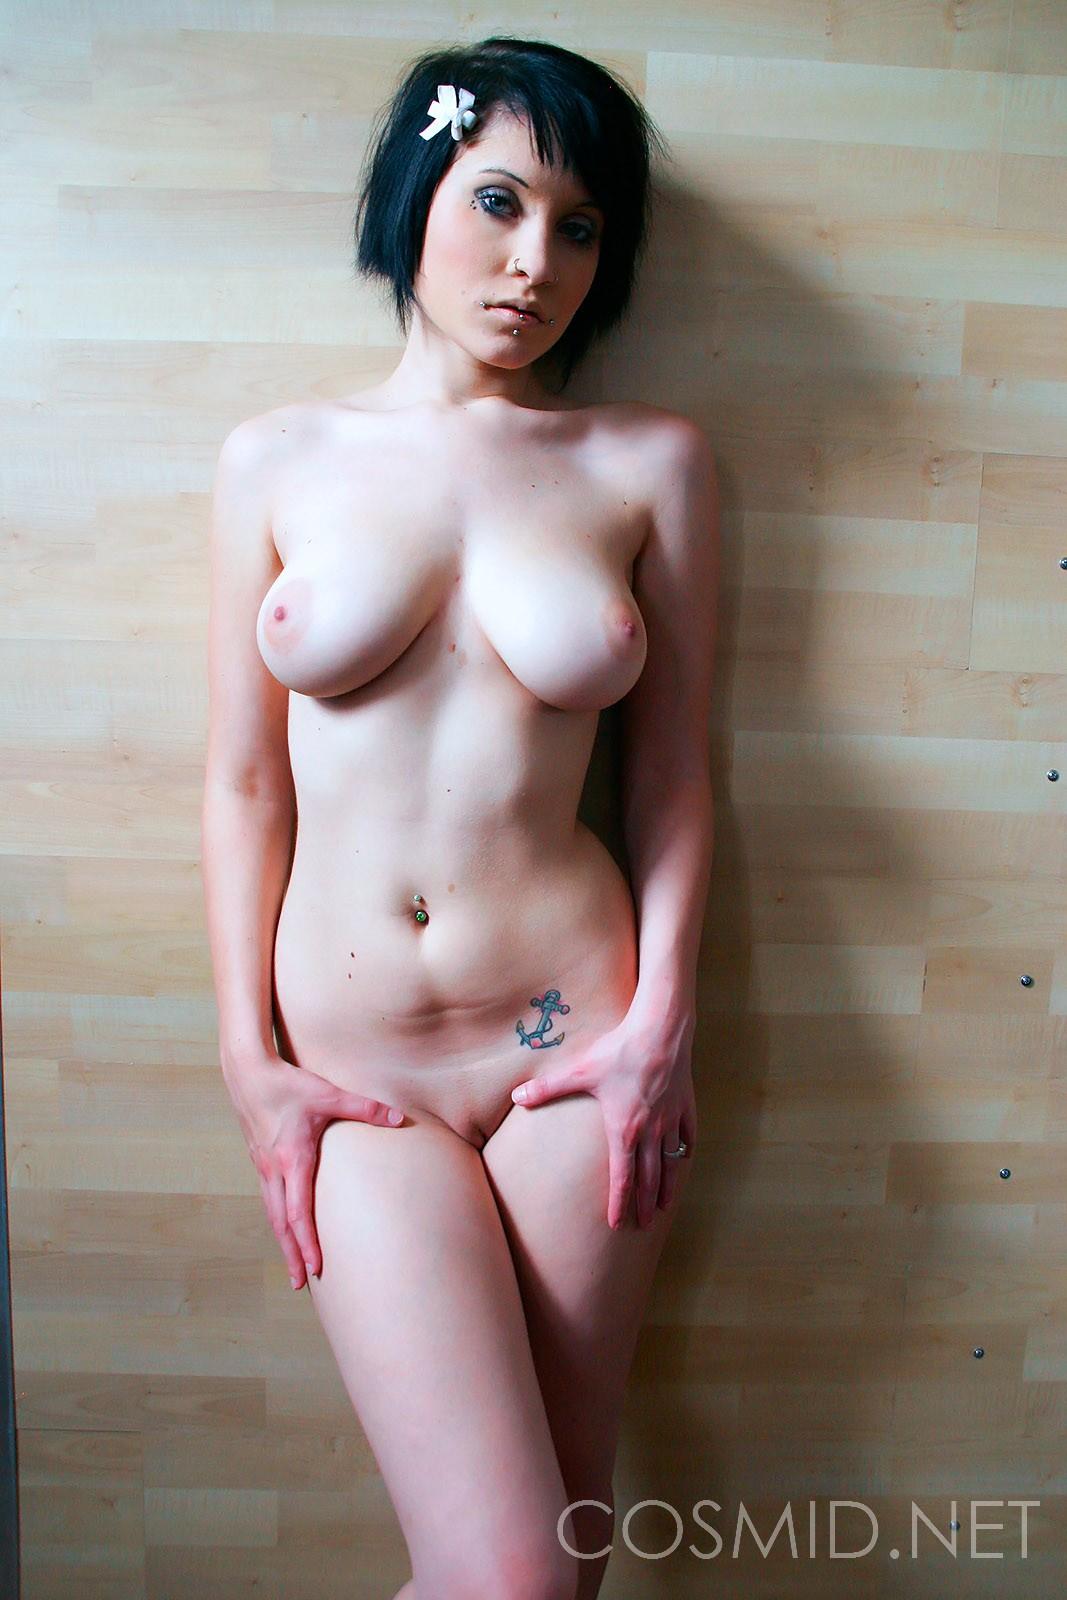 Are Ordinary girls nude photo mine, someone